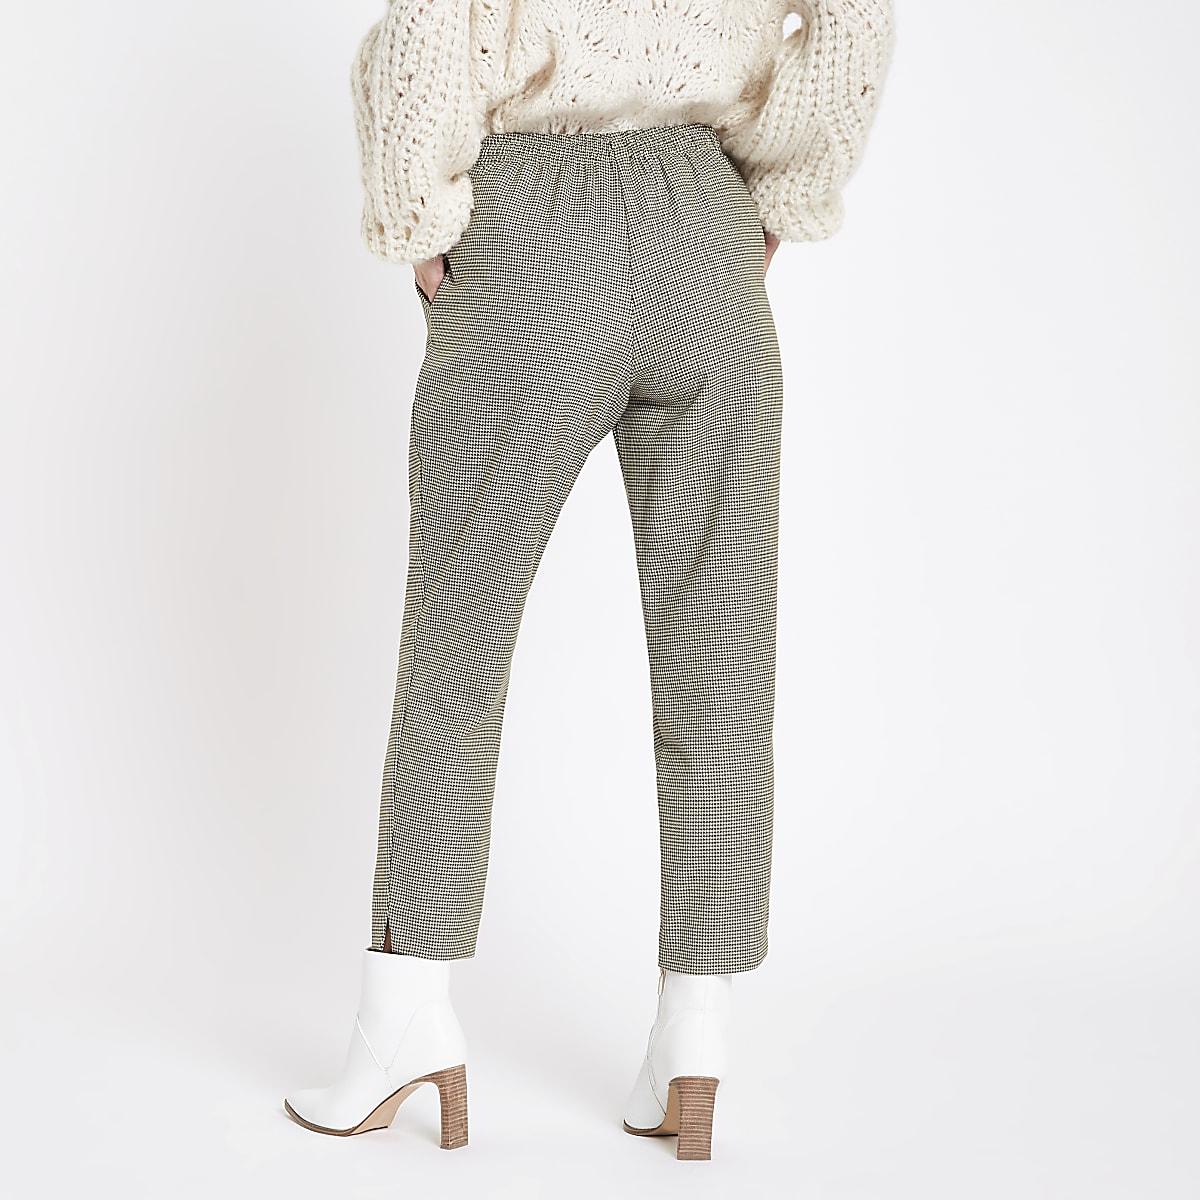 27530921abfa25 Petite grey check tie waist tapered trousers - Tapered Trousers - Trousers  - women